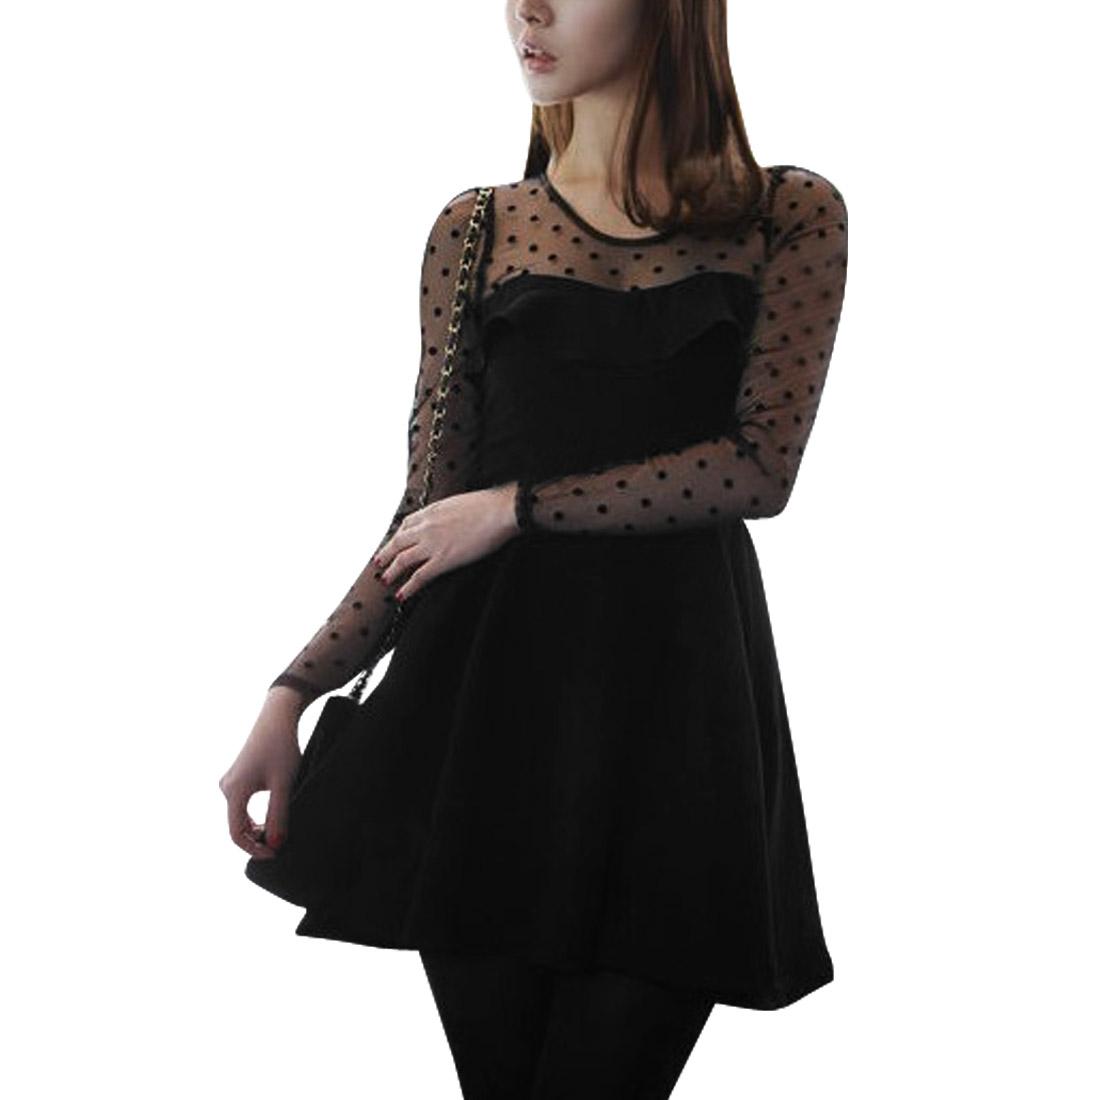 Women Scoop Neck Long Sleeved Dots Mesh Splicing Black Sexy Dress XS